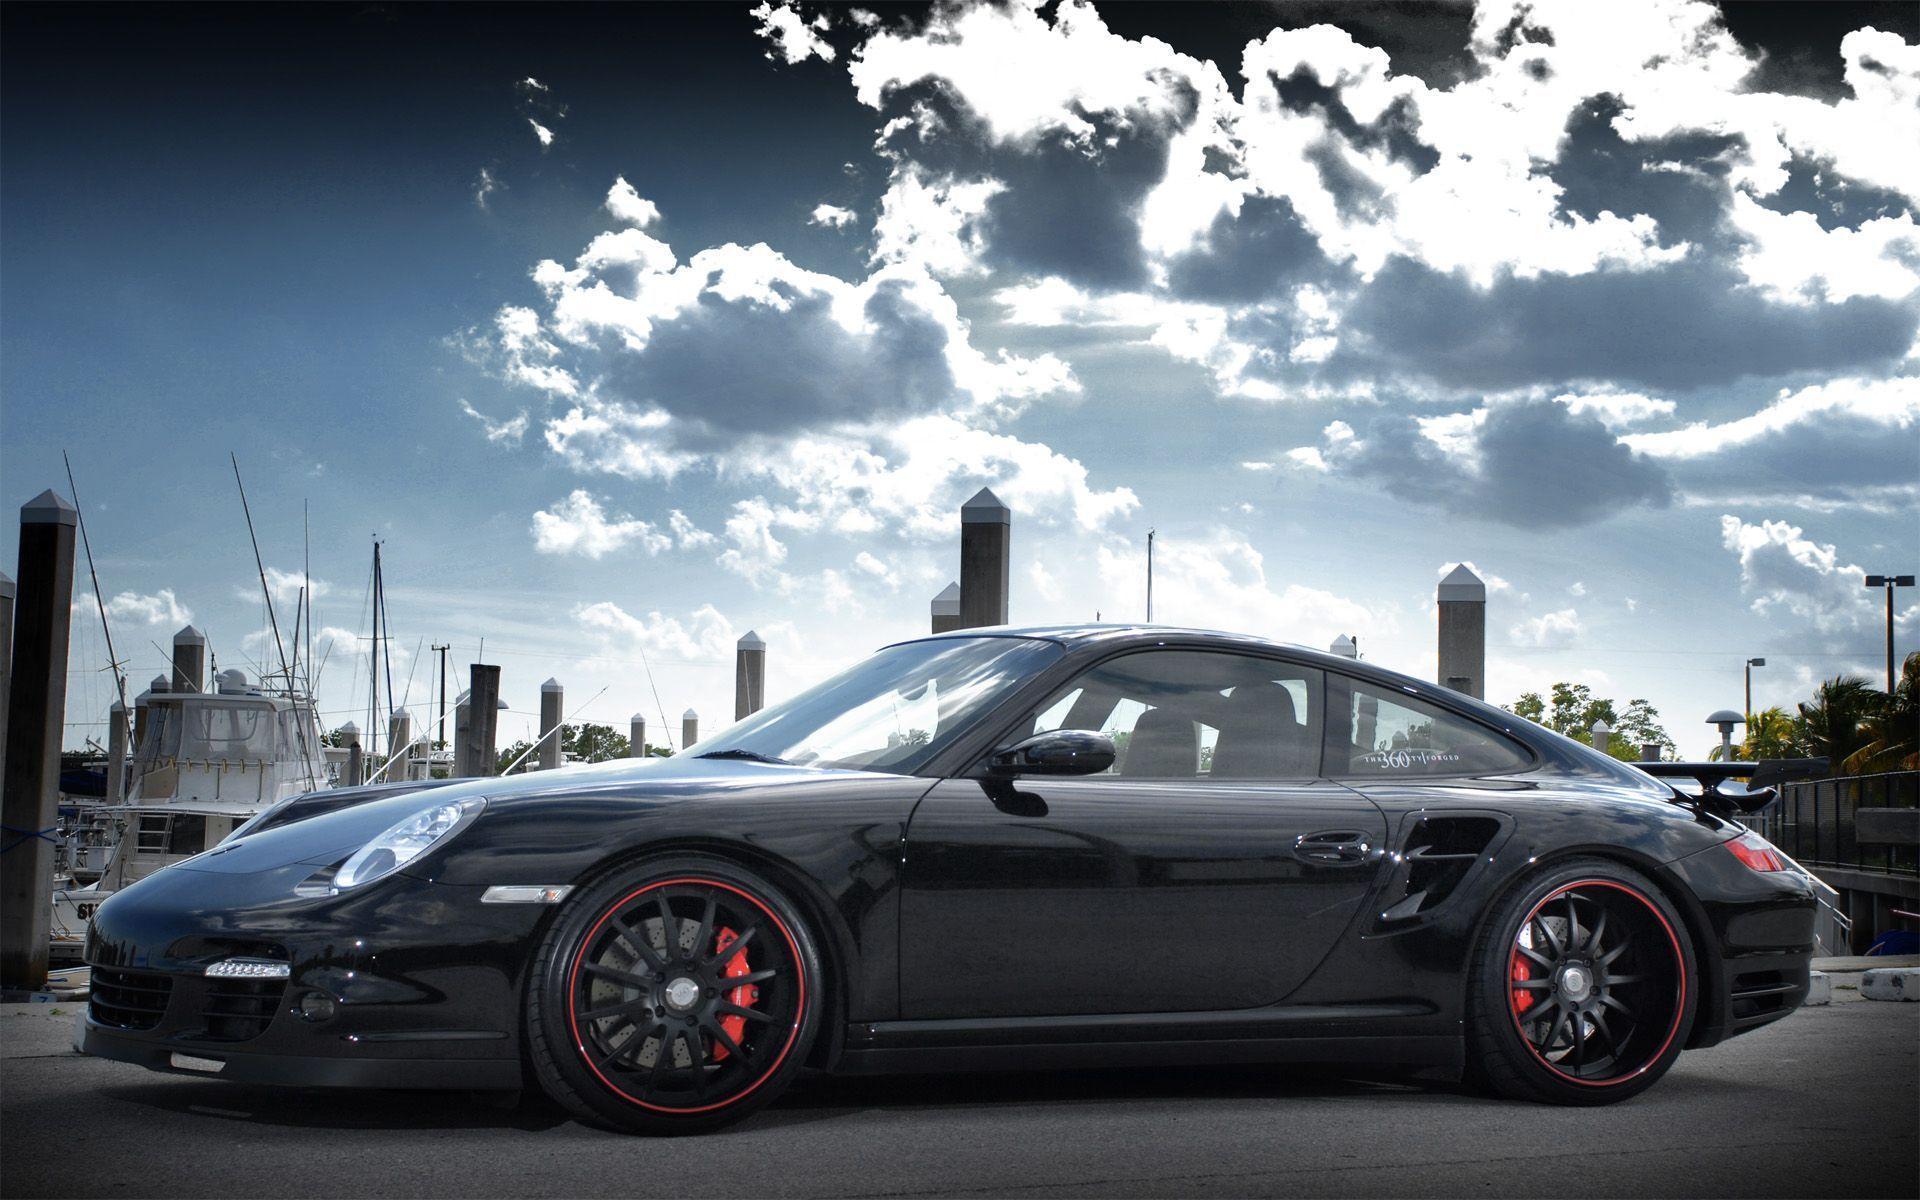 Porsche Wallpaper 14378 1920x1200 px ~ FreeWallSource.